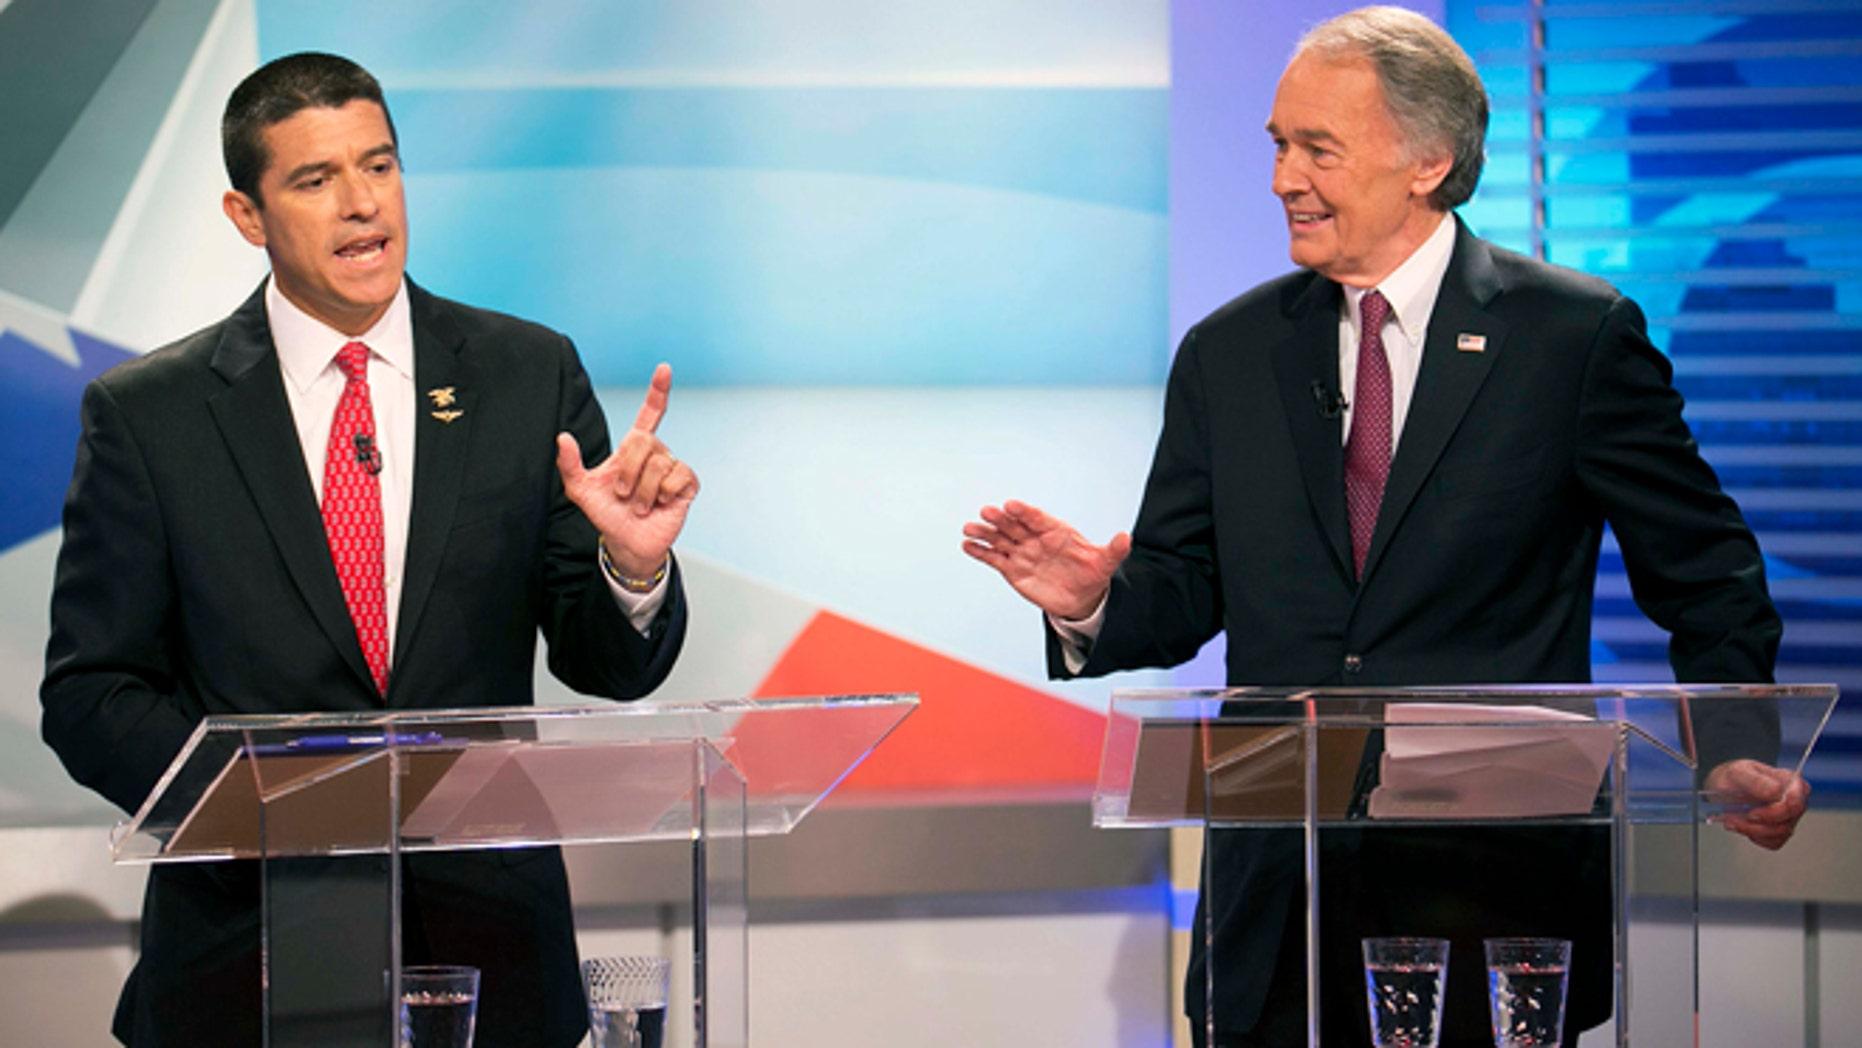 U.S. Senate candidate Republican Gabriel Gomez, left, Democrat Edward Markey, right, in their first debate on June 5, 2013 in Brighton, Mass.